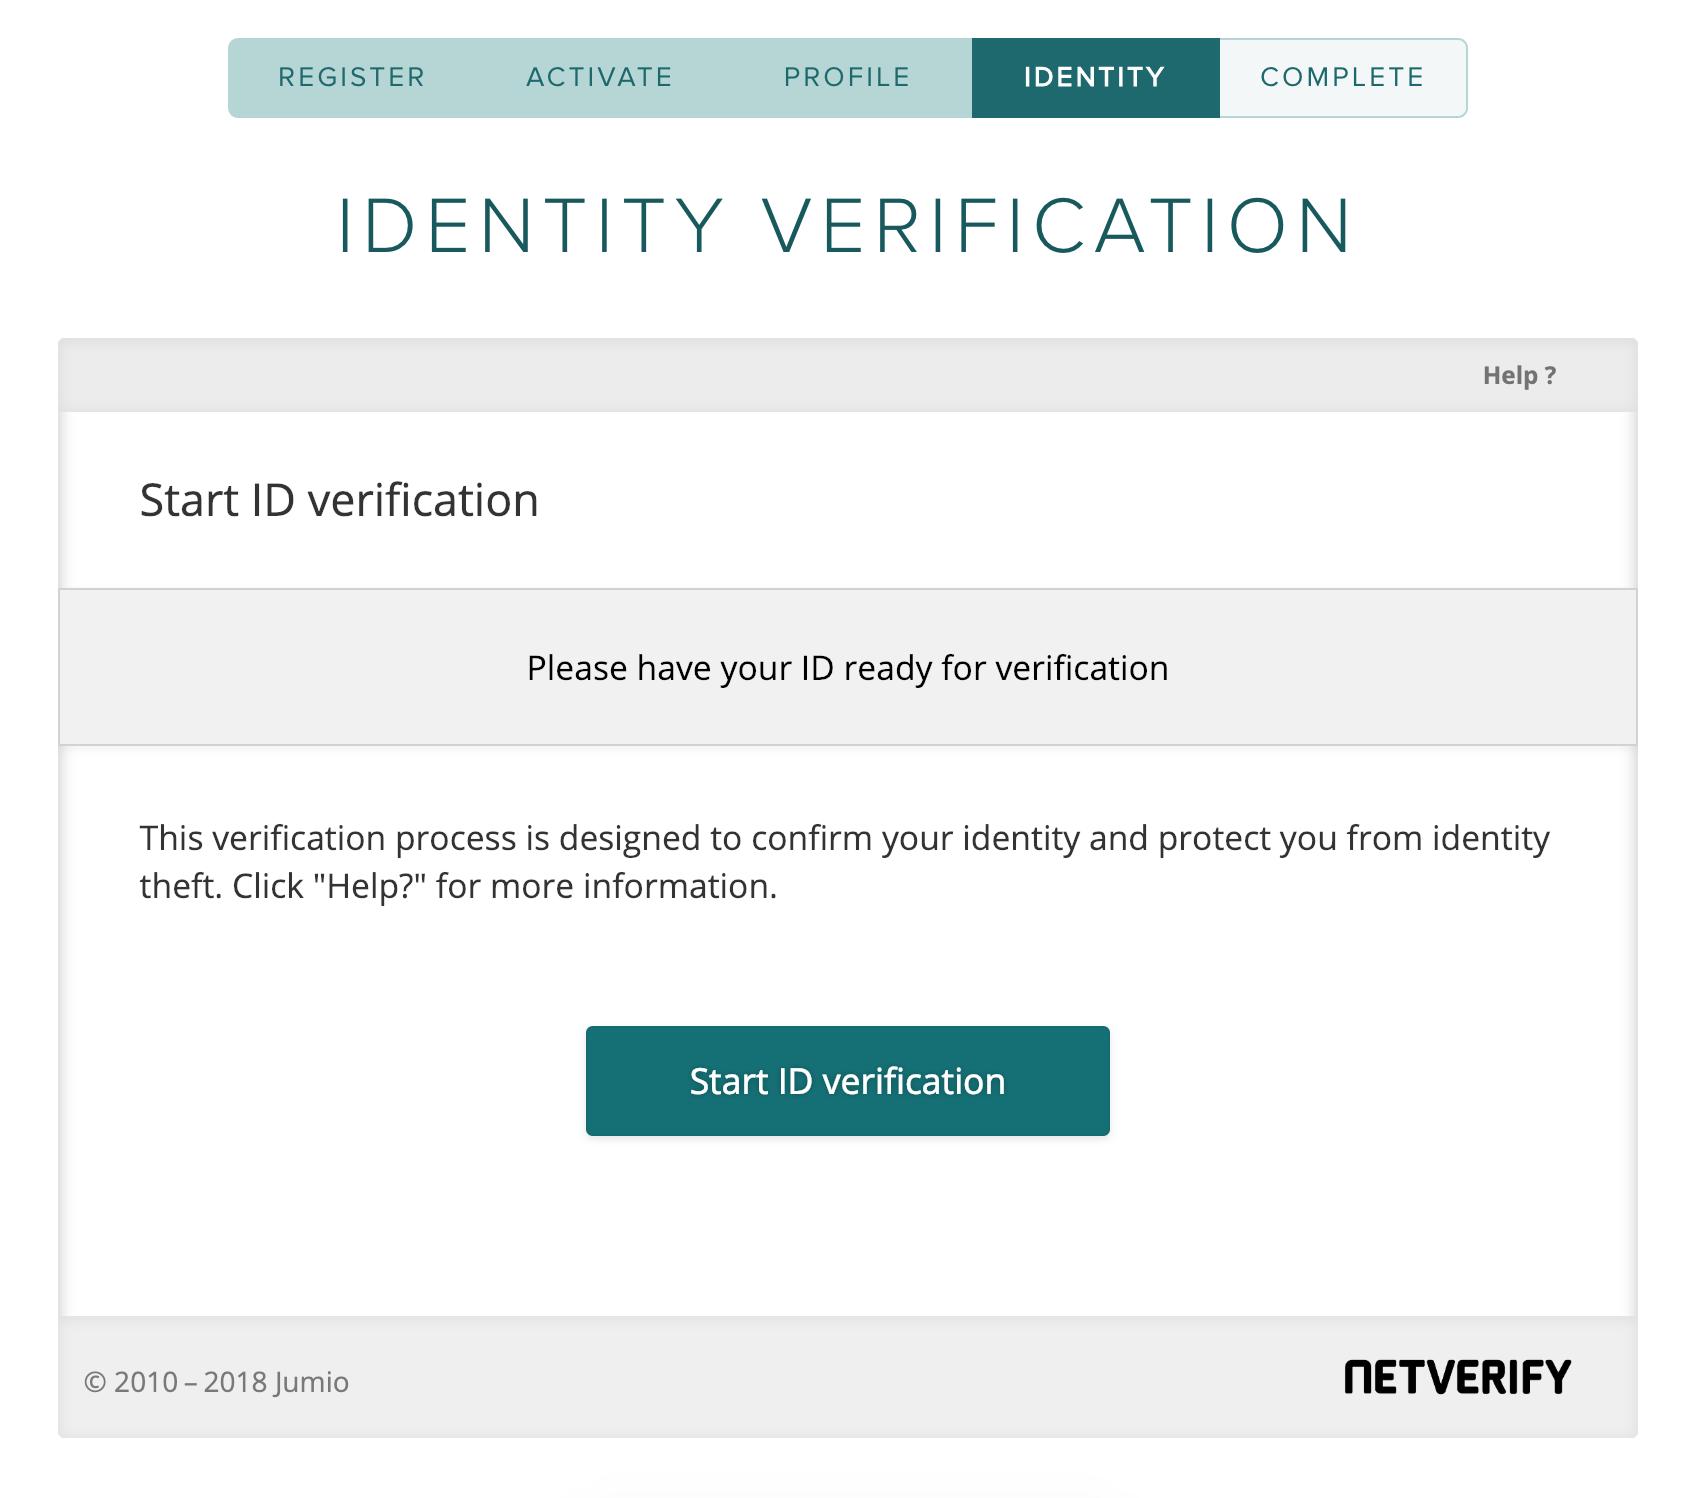 Poloniex account sign up Identity Verification Start ID Verification page.